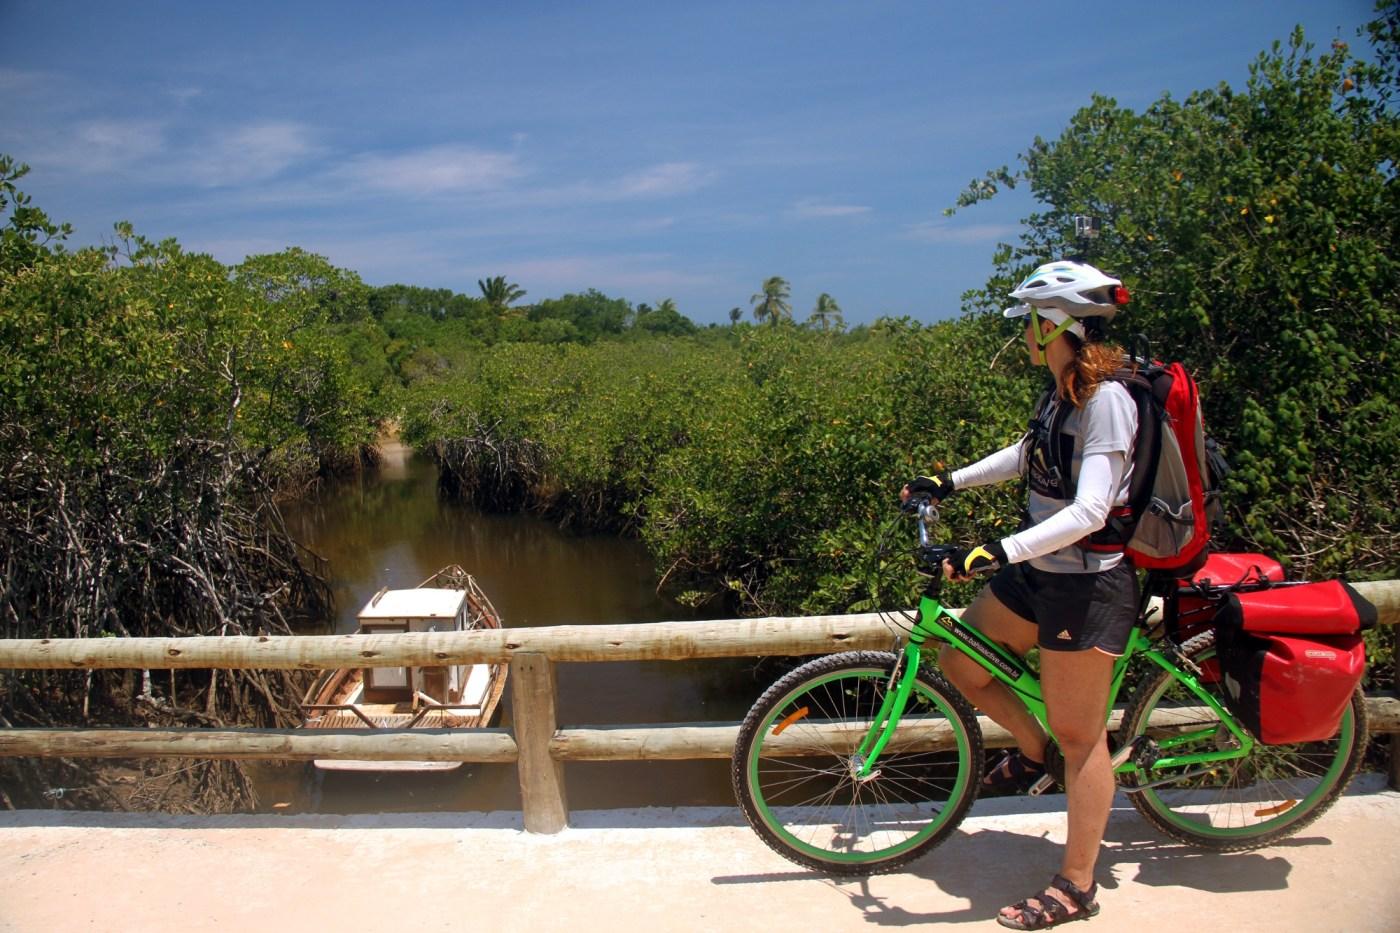 Vista do Rio Trancoso, no sul da Bahia (foto: Eduardo Vessoni)